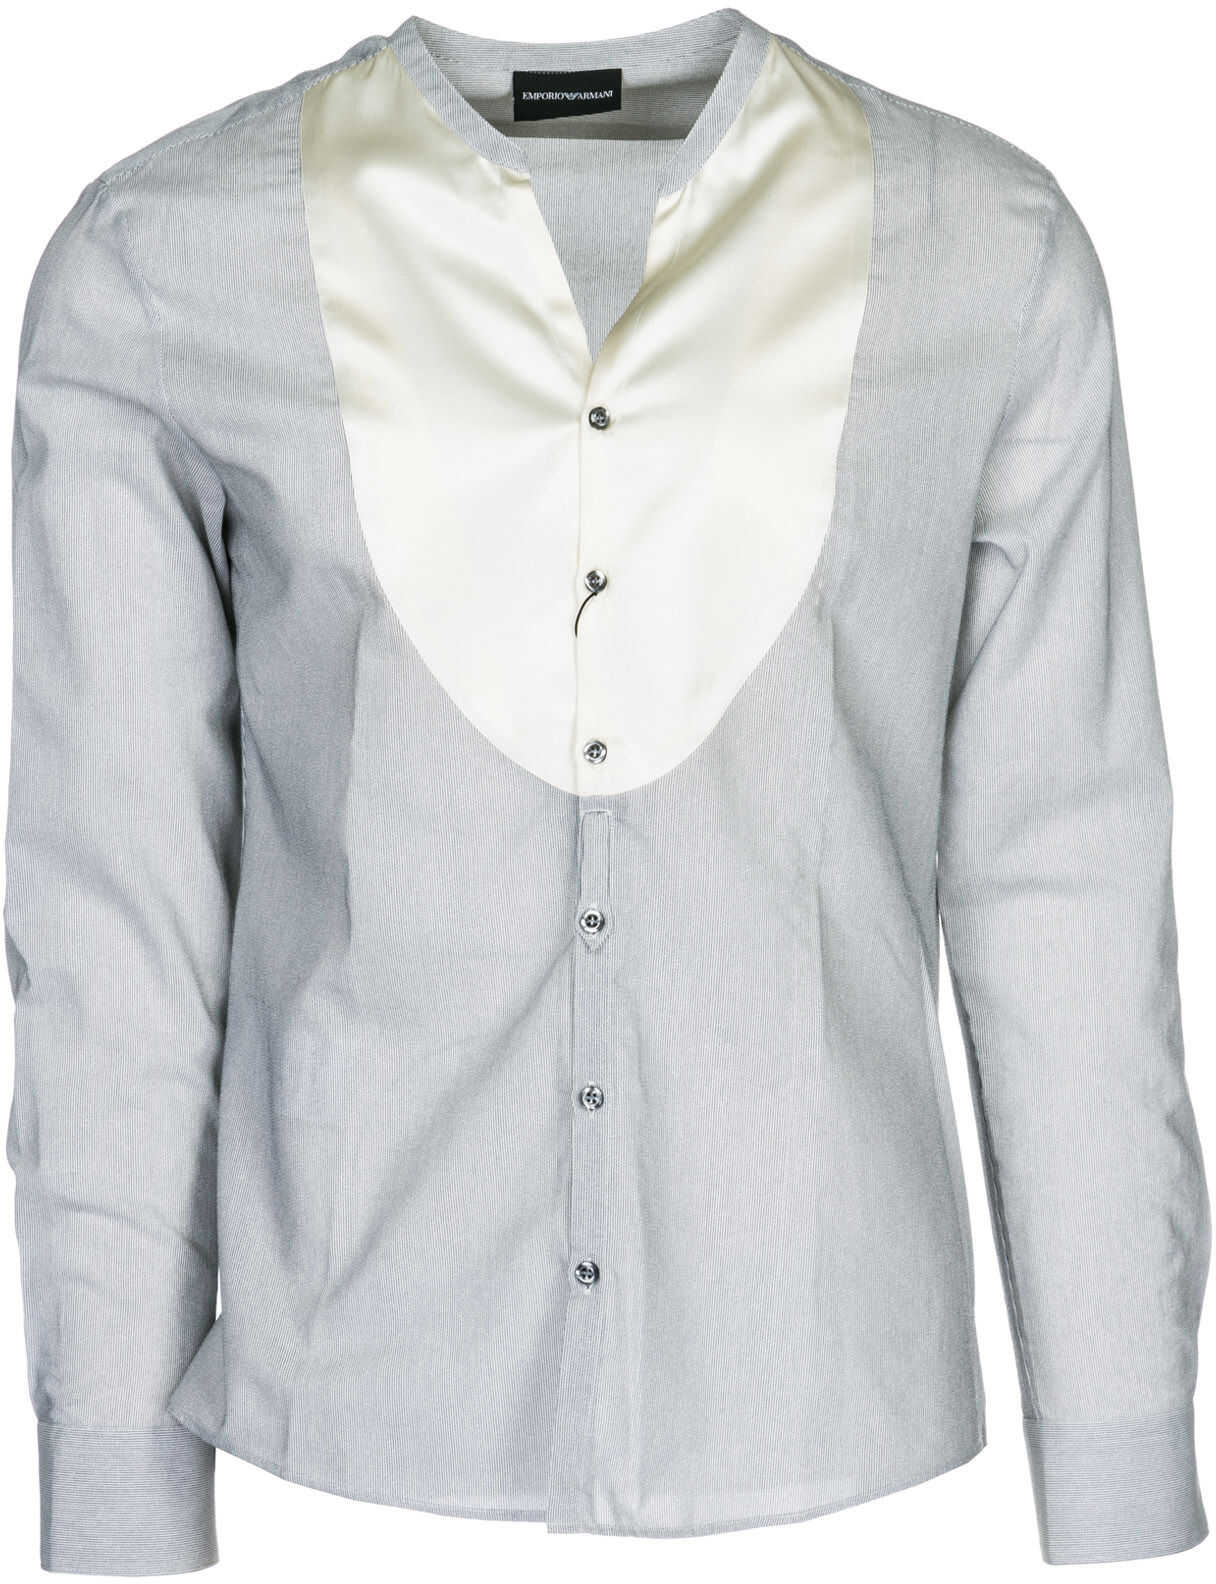 Emporio Armani Dress Shirt Grey imagine